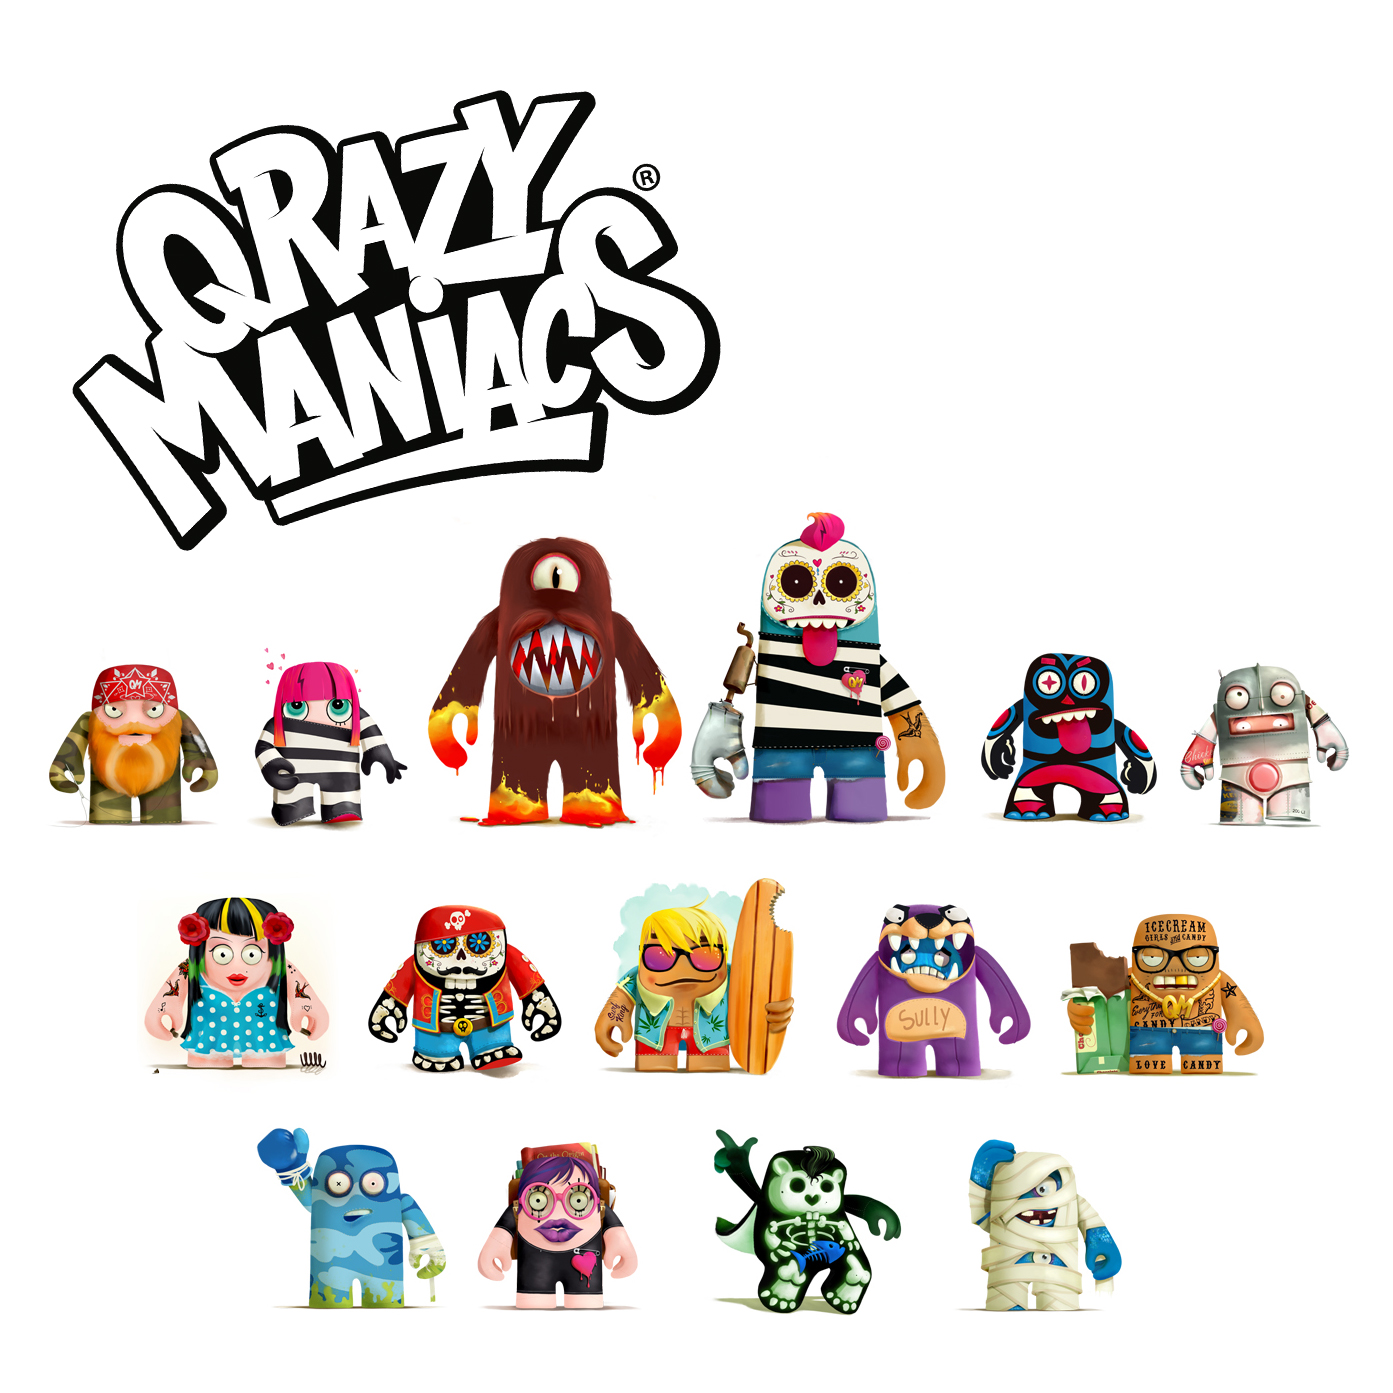 Design character figurines |Studio Monnikenwerk ©